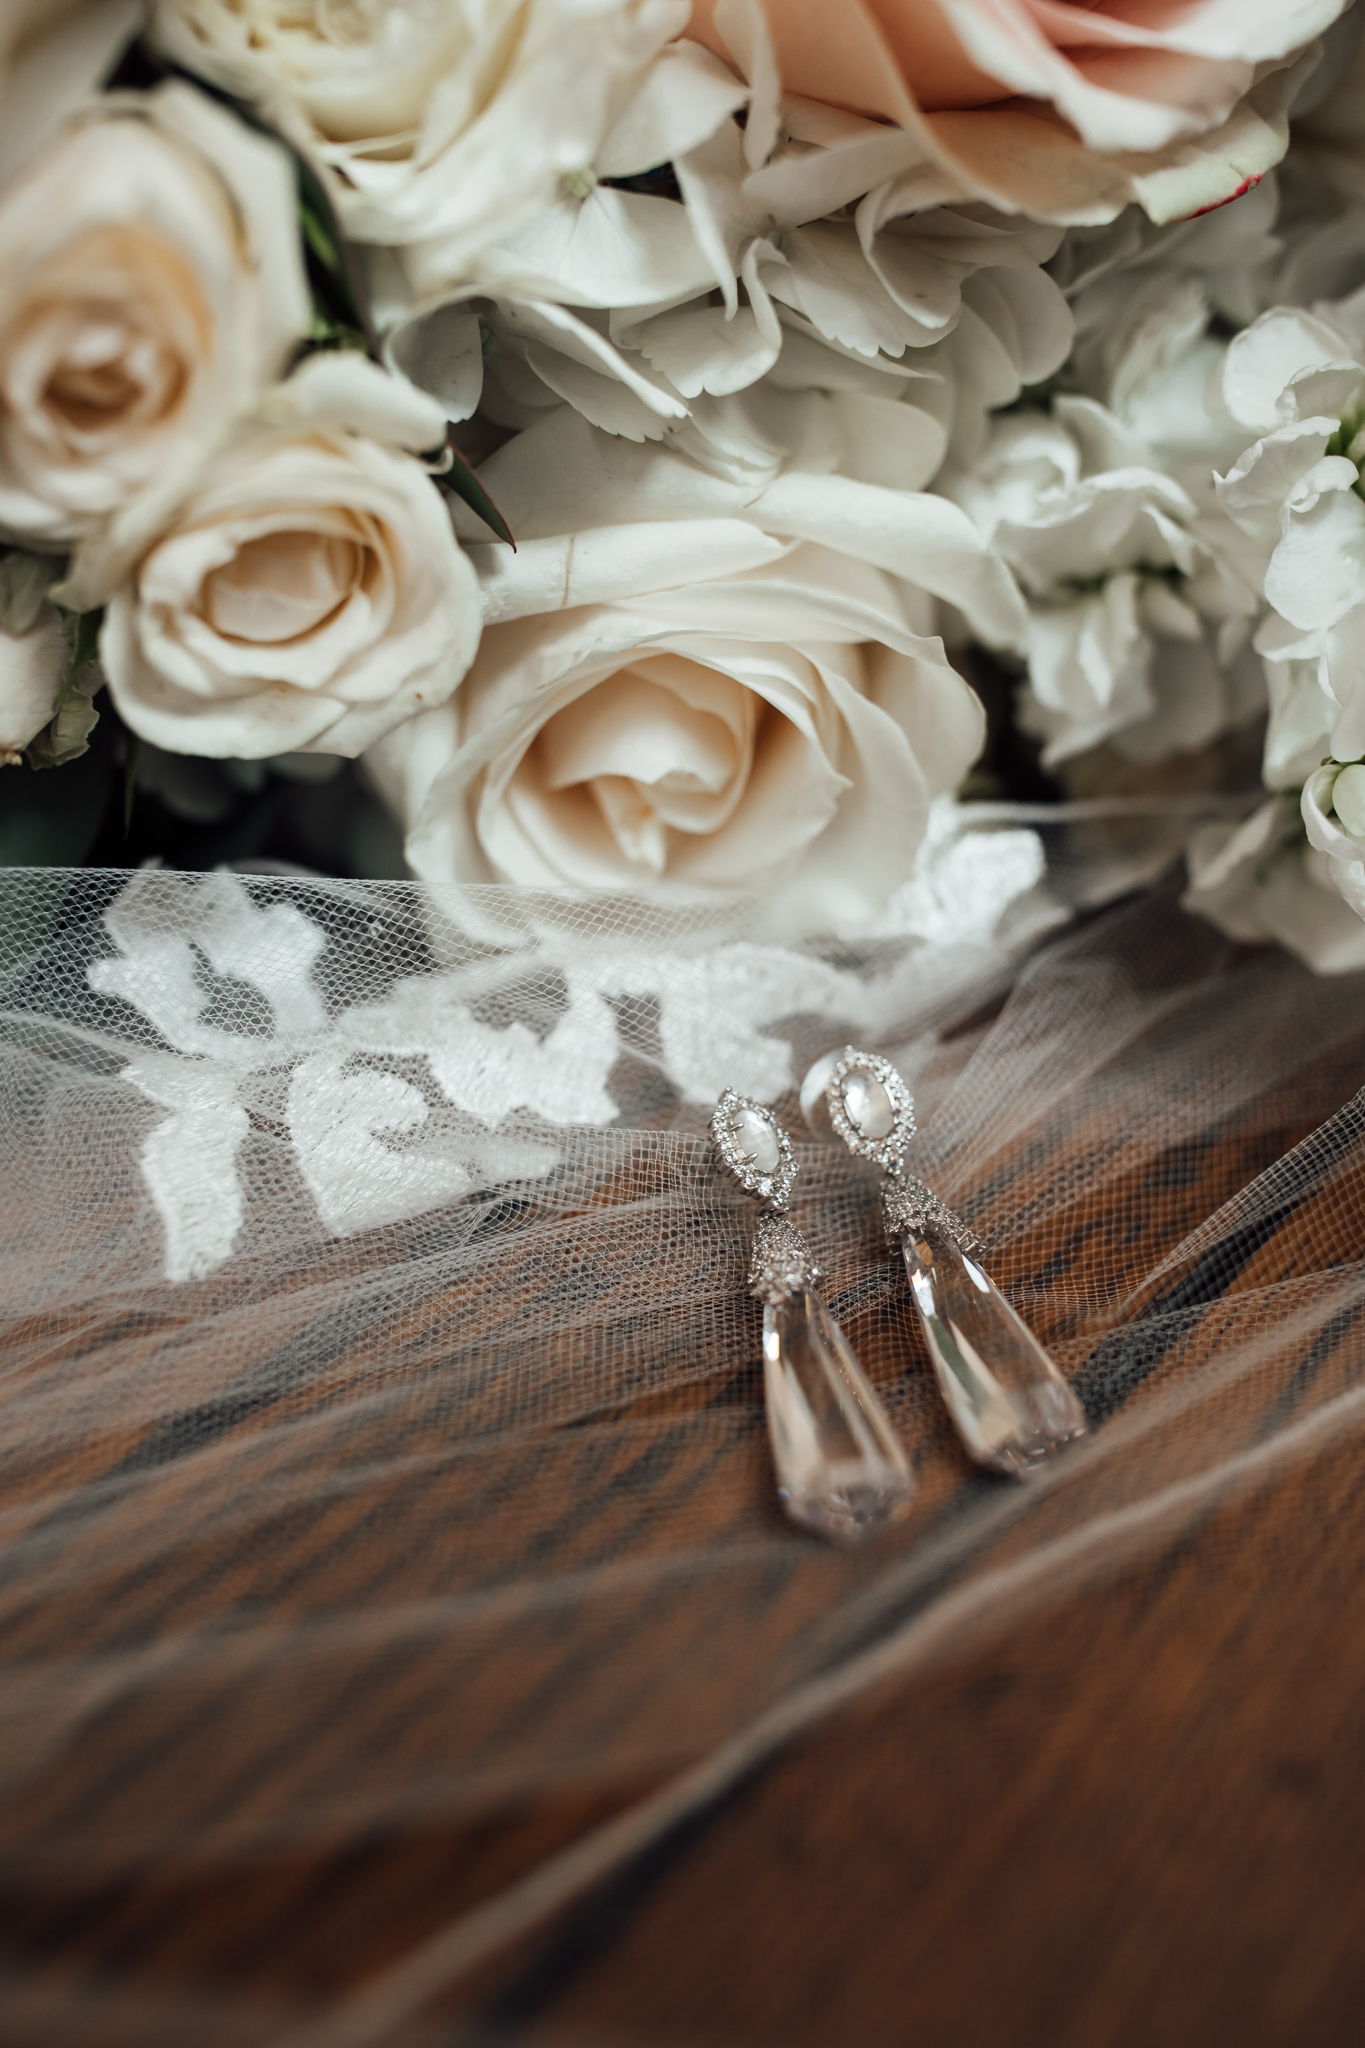 409smain-downtown-memphis-wedding-venue-thewarmtharoundyou (4 of 243).jpg